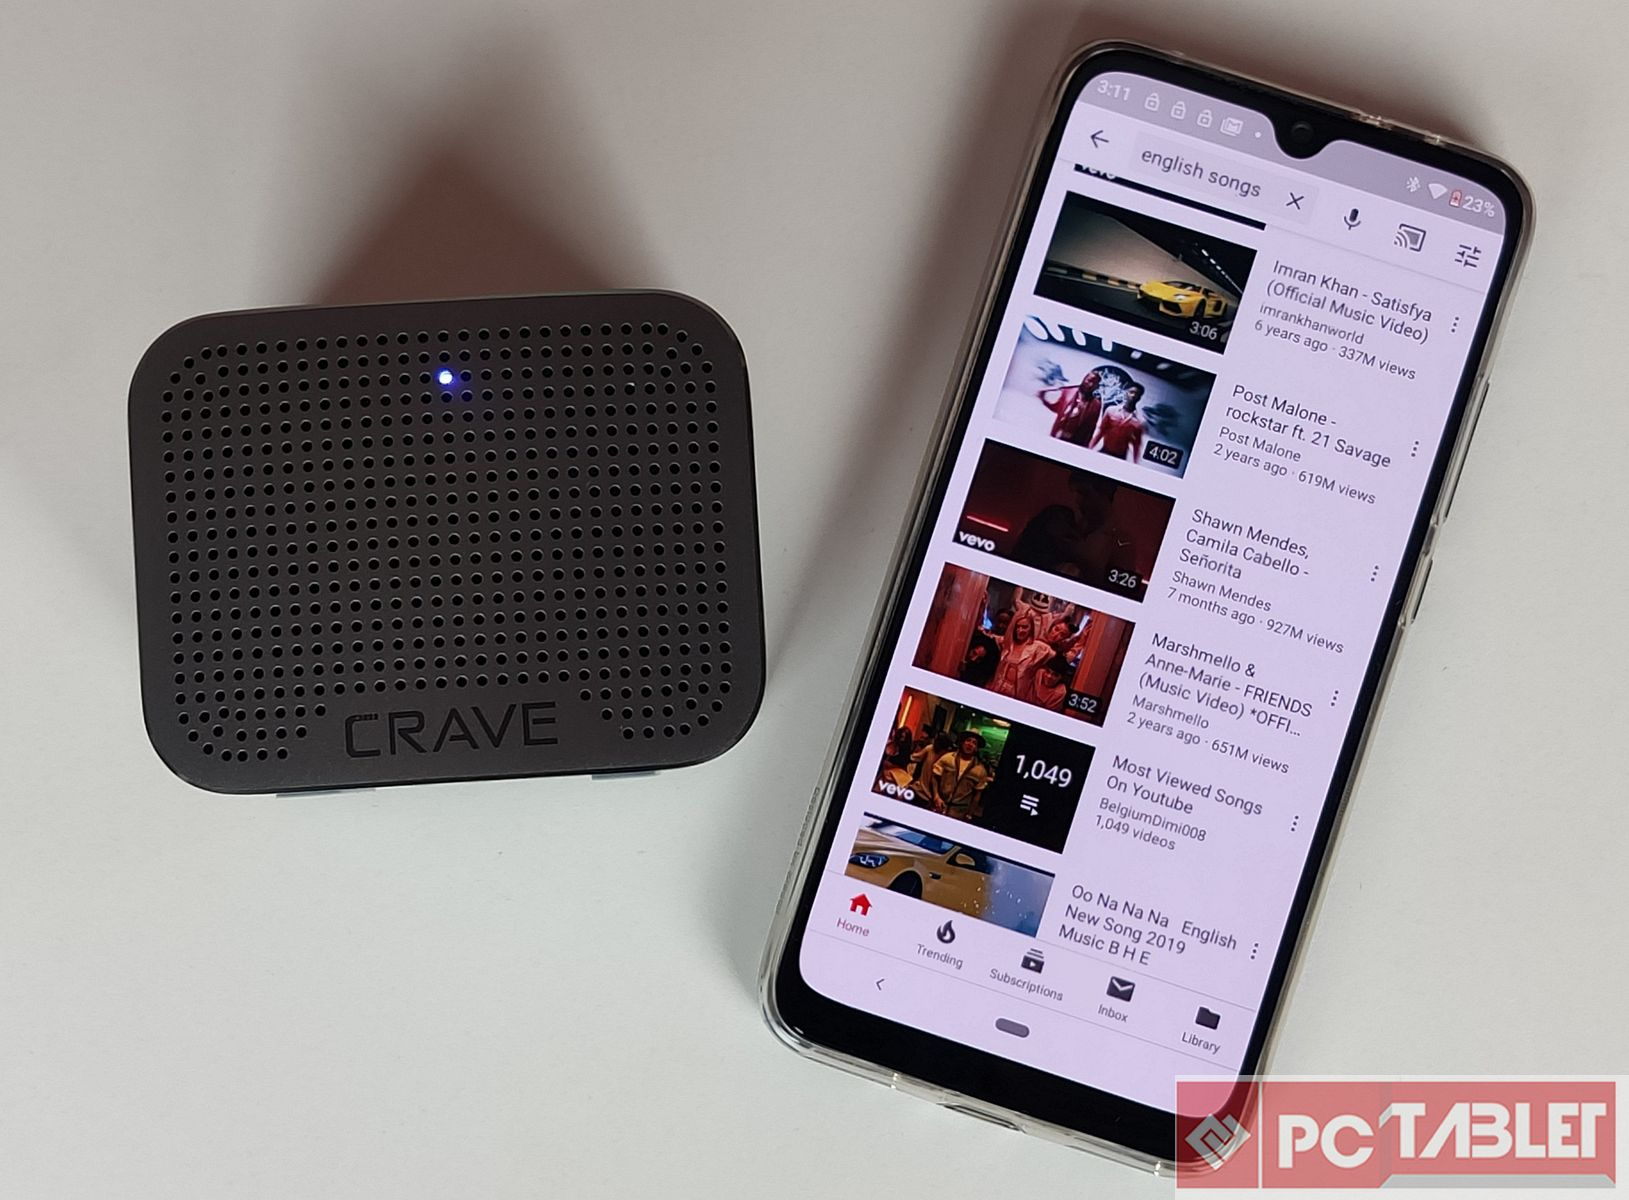 Crave Curve Mini Bluetooth speaker amp Crave Travel Power bank Review 6